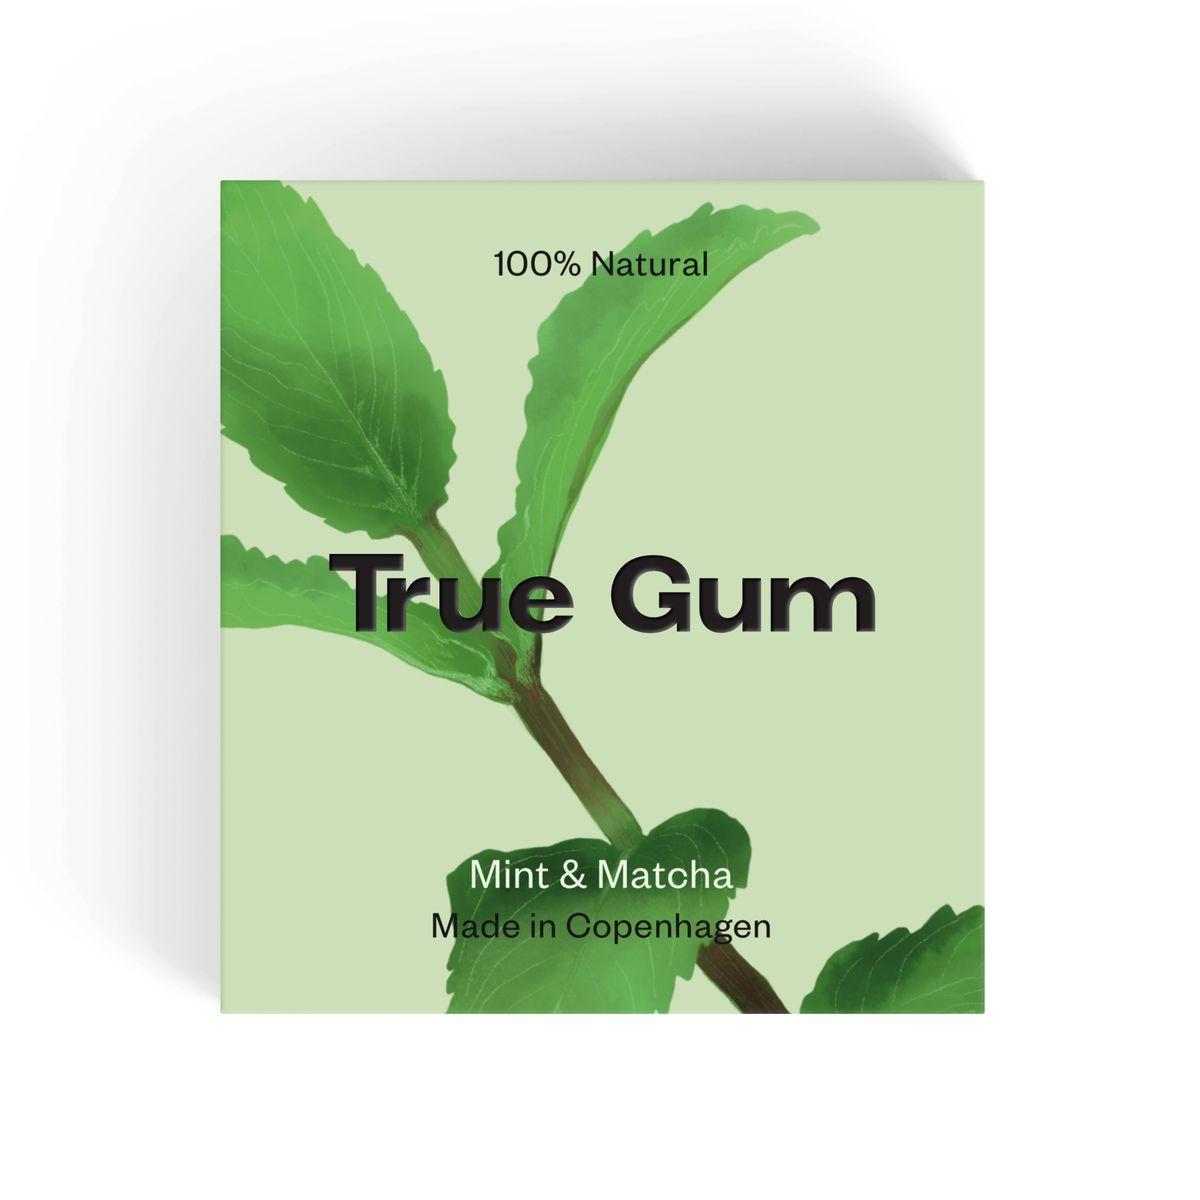 True Gum mint & matcha 21 gr